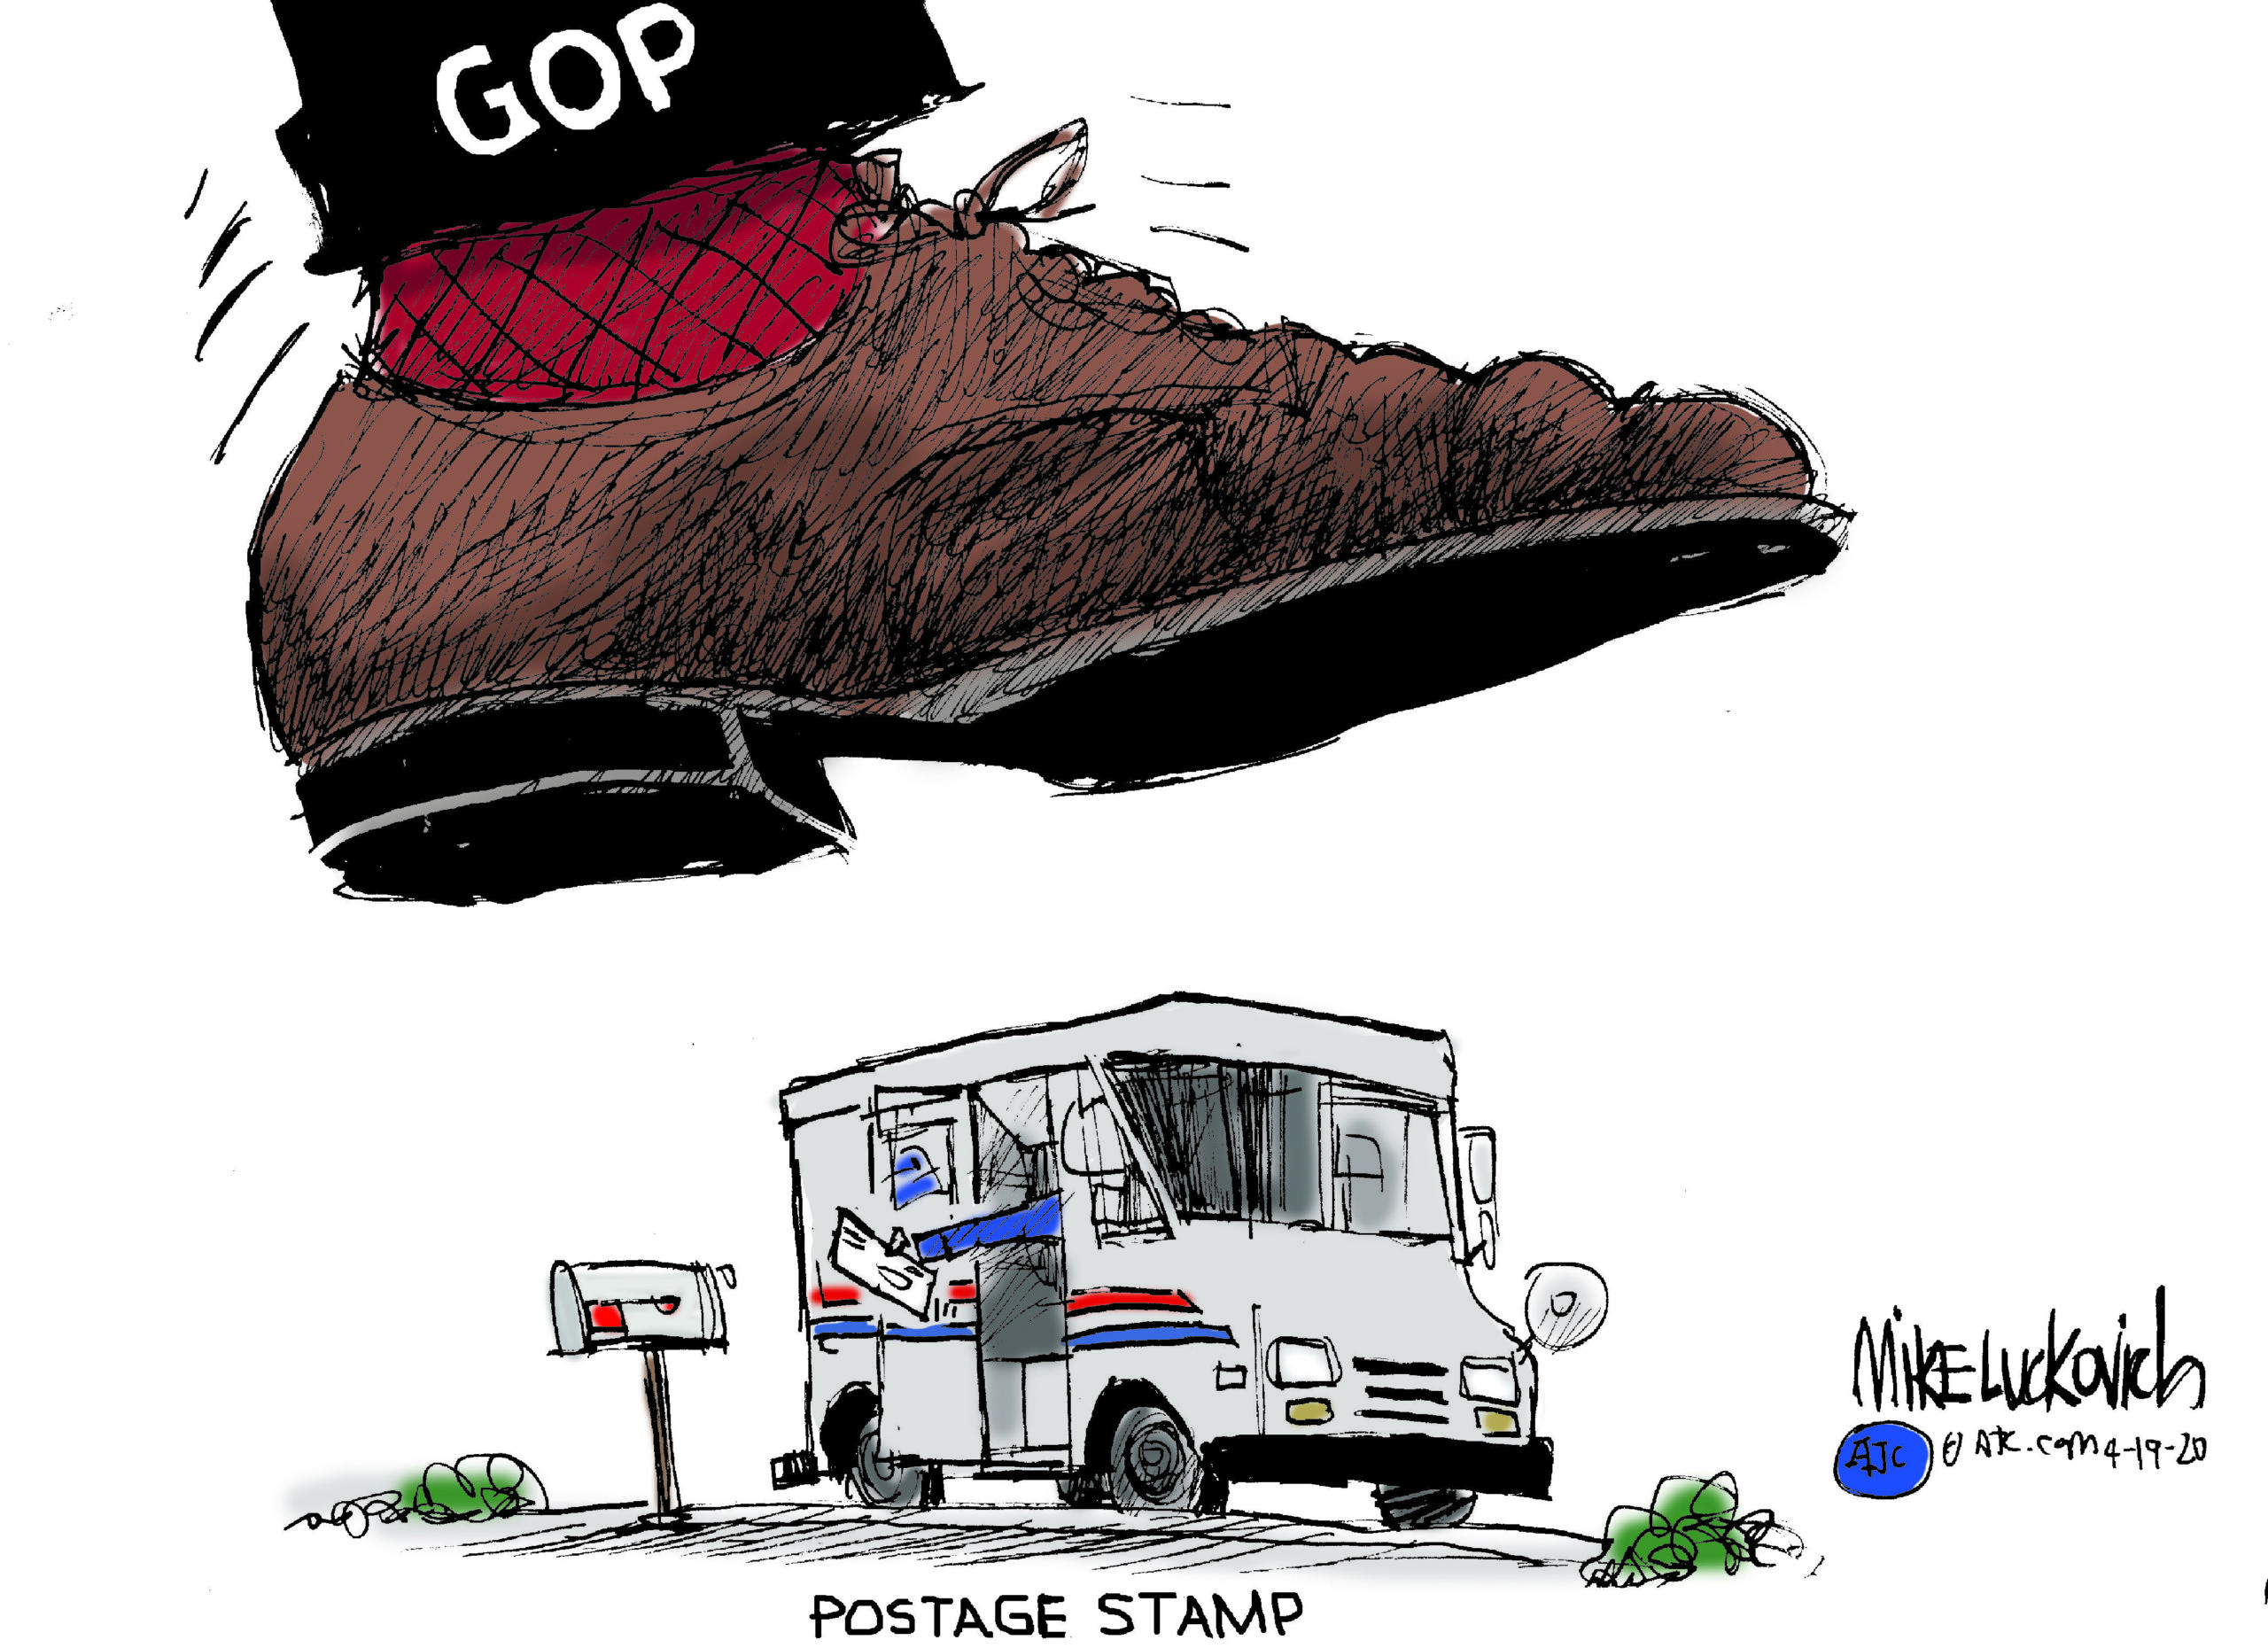 April 18: Postal Service